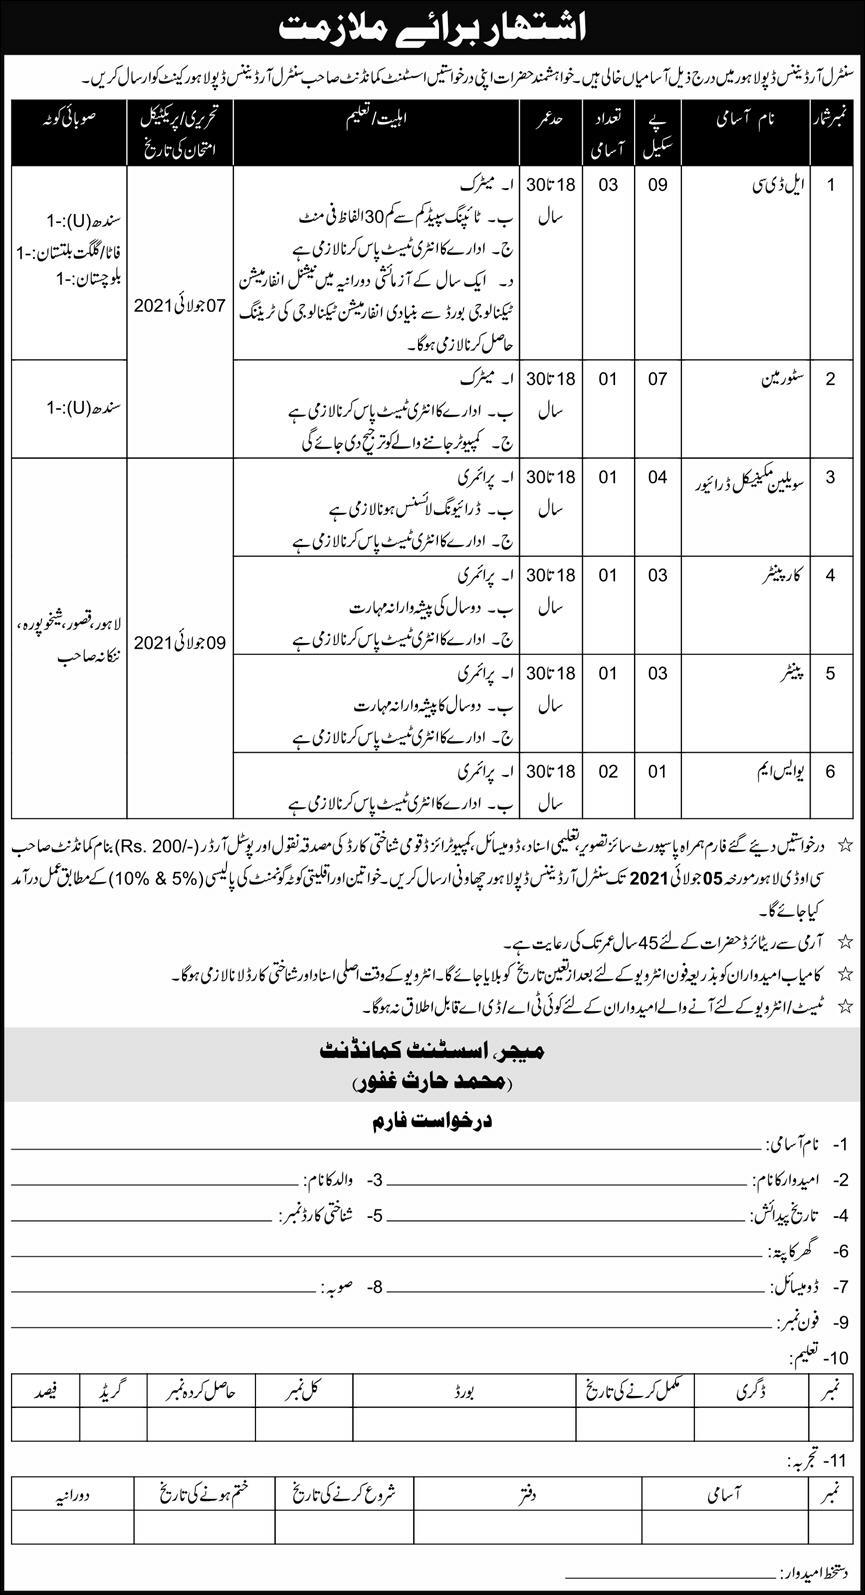 Pakistan Army COD Jobs